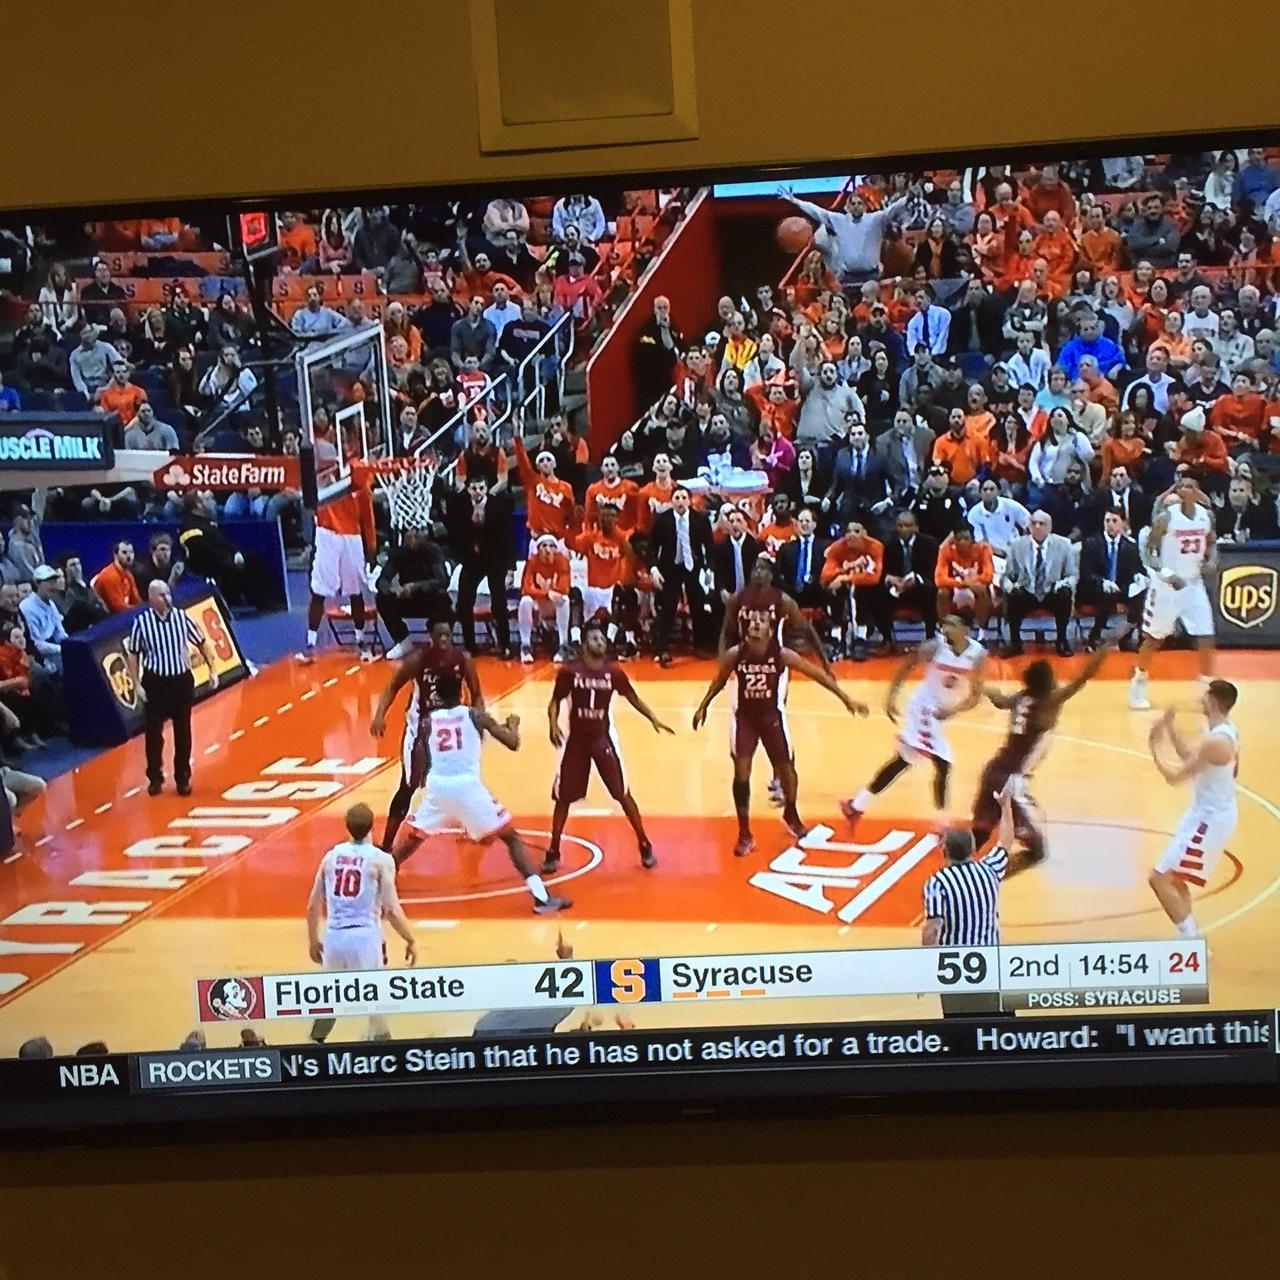 Syracuse vs. Florida State